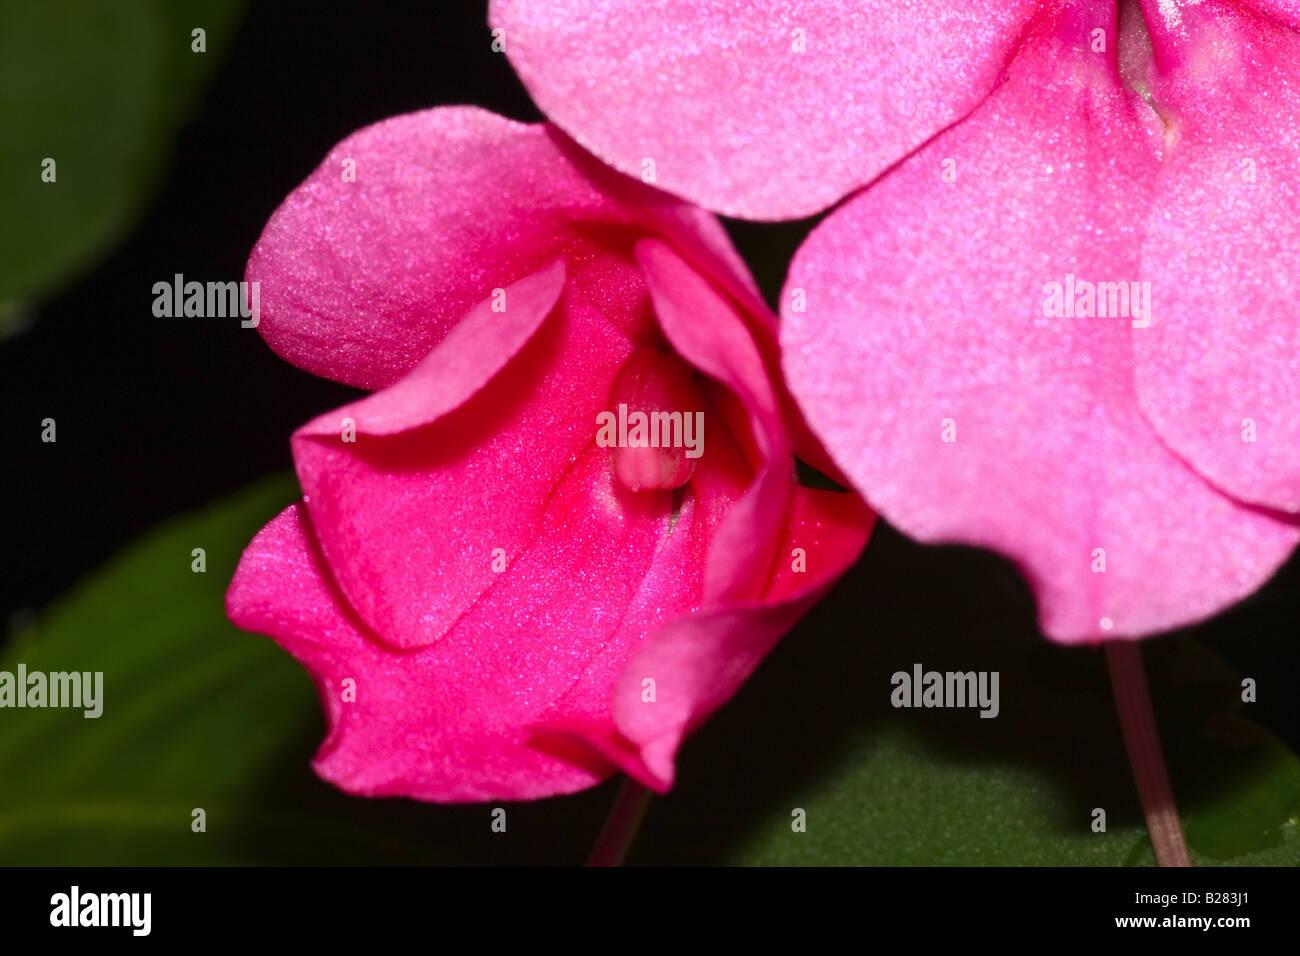 Pink Impatient Close Up Stock Photo